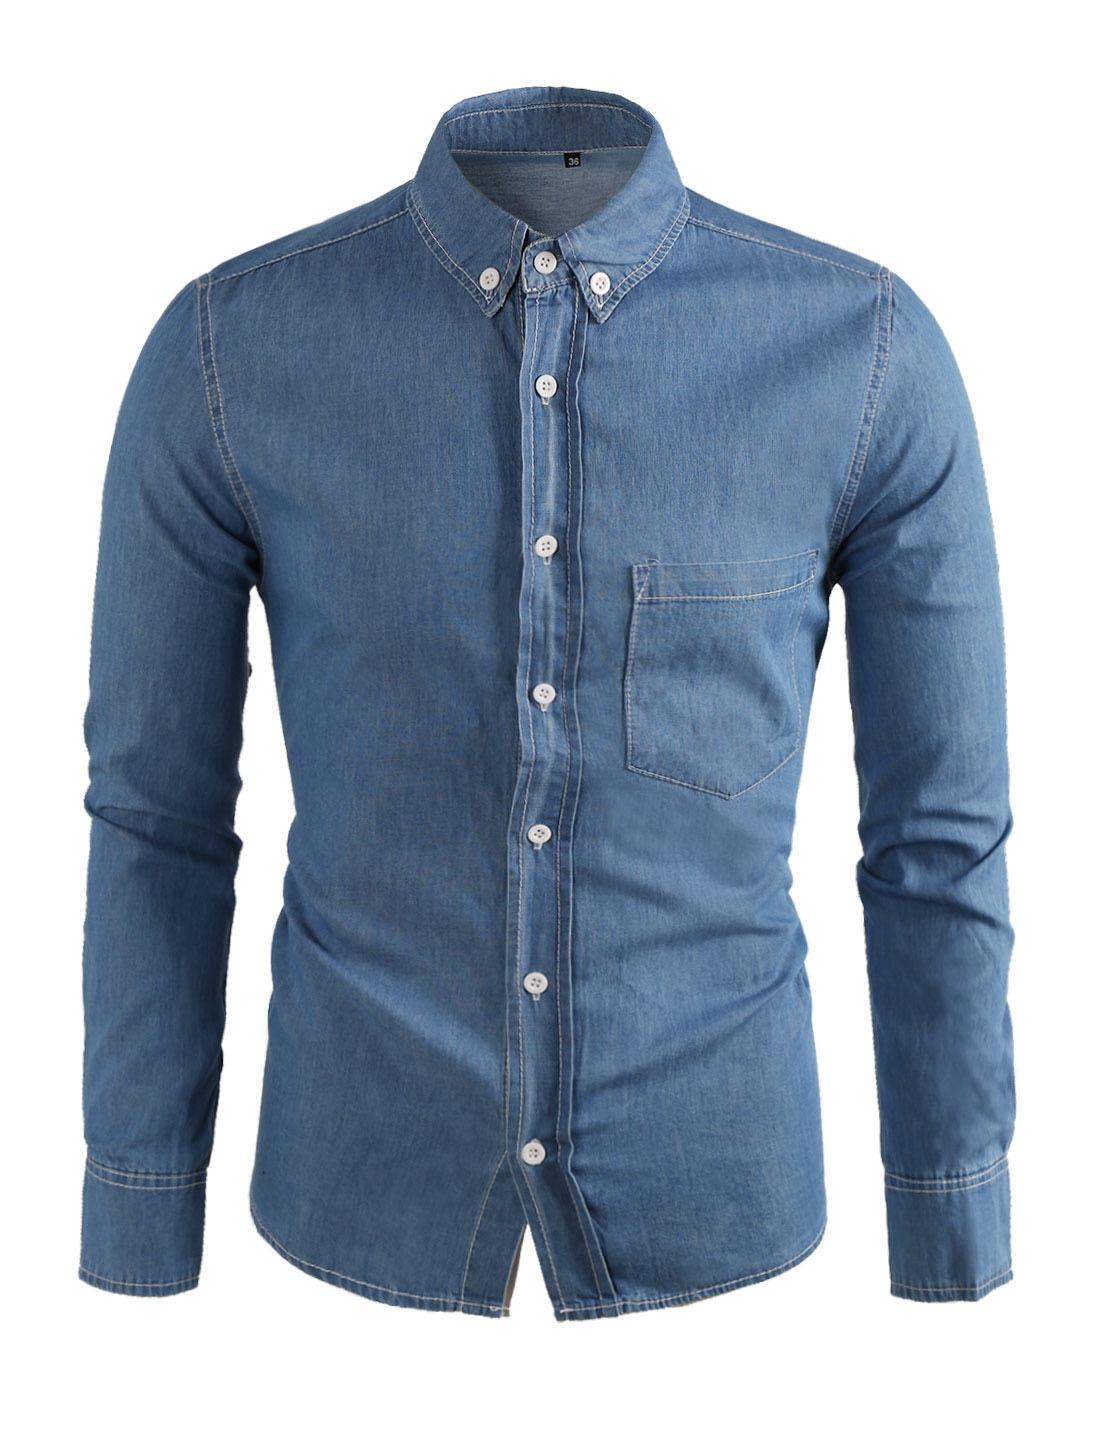 Men Button-Collar Single Breasted Long Sleeves Denim Shirt Blue S